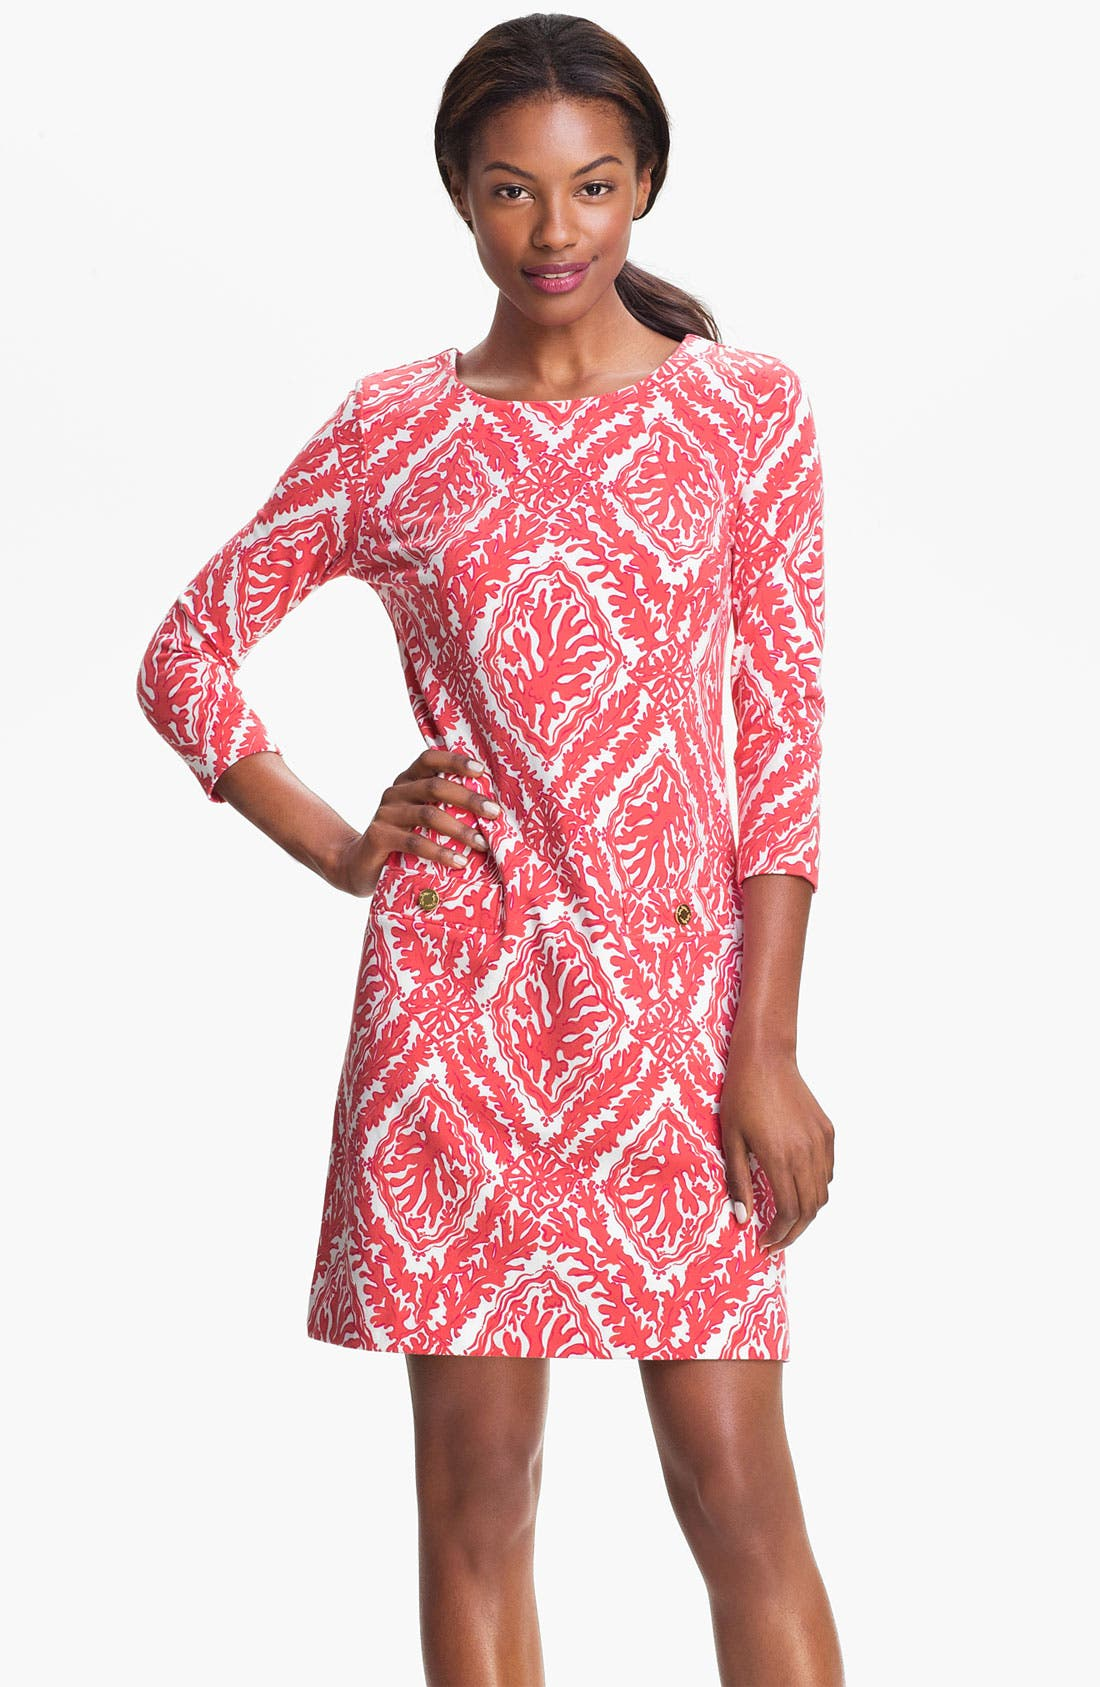 Main Image - Lilly Pulitzer® 'Charlene' Coral Knit Shift Dress